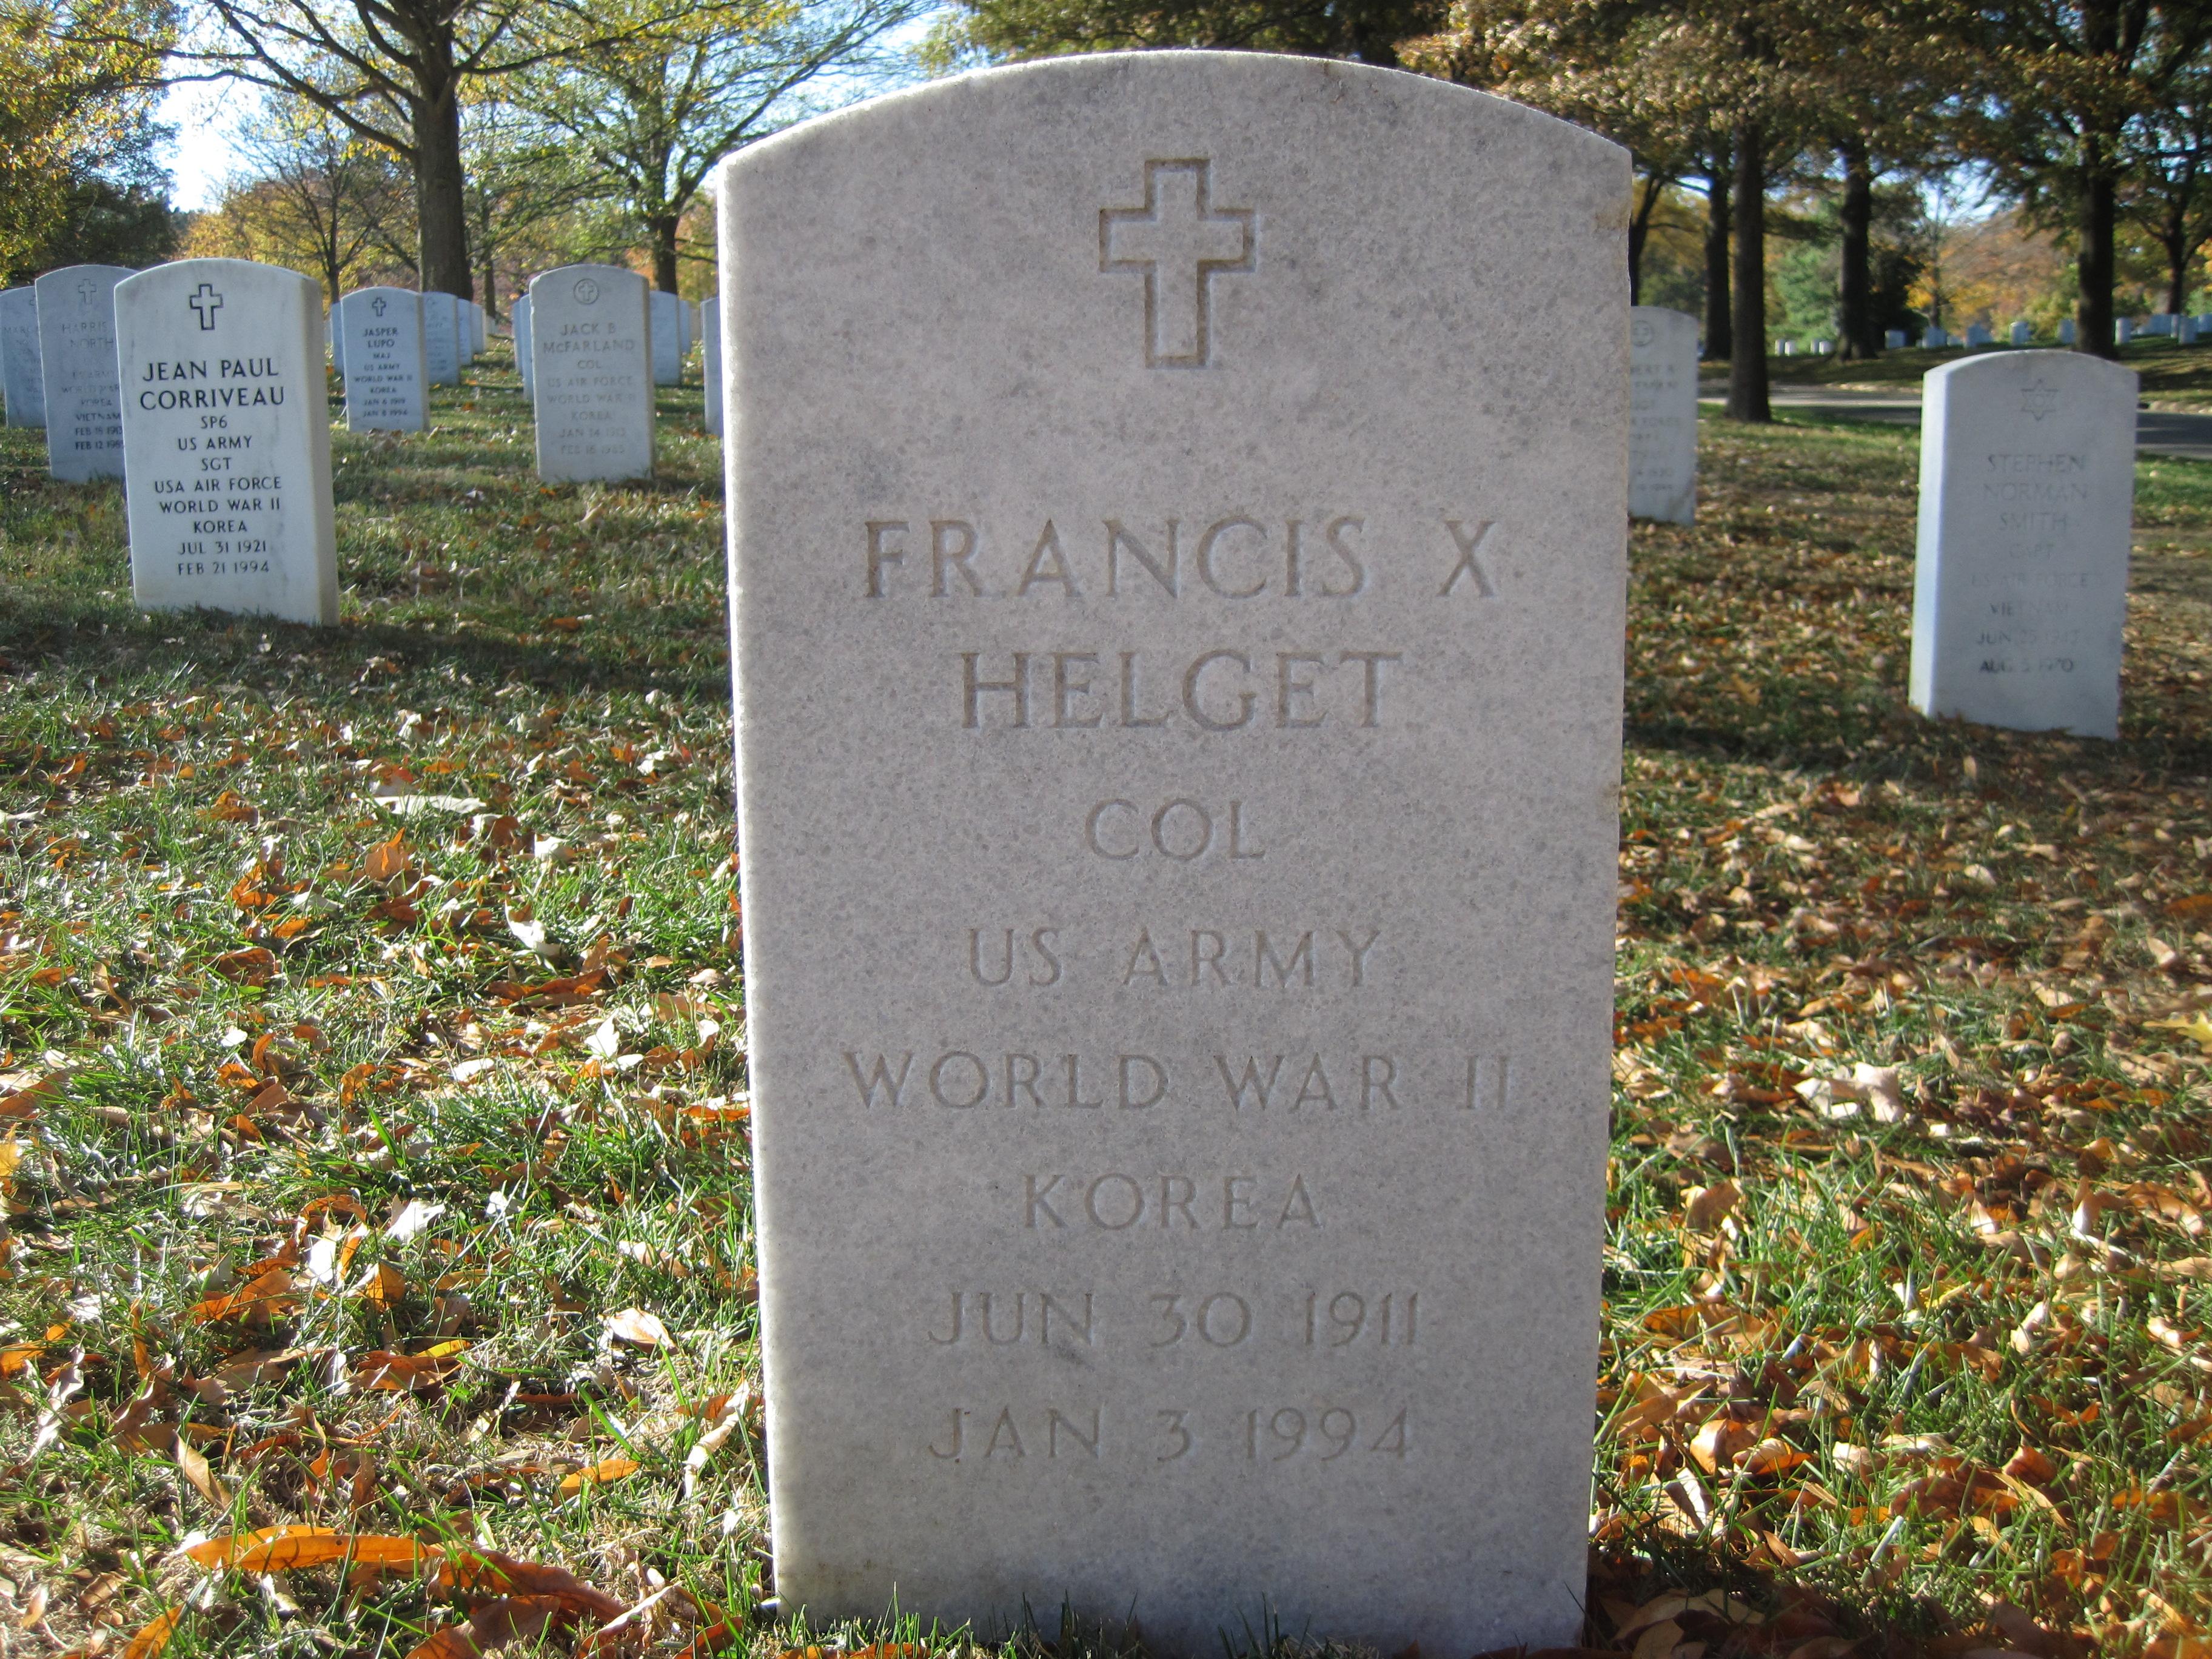 Francis X Helget